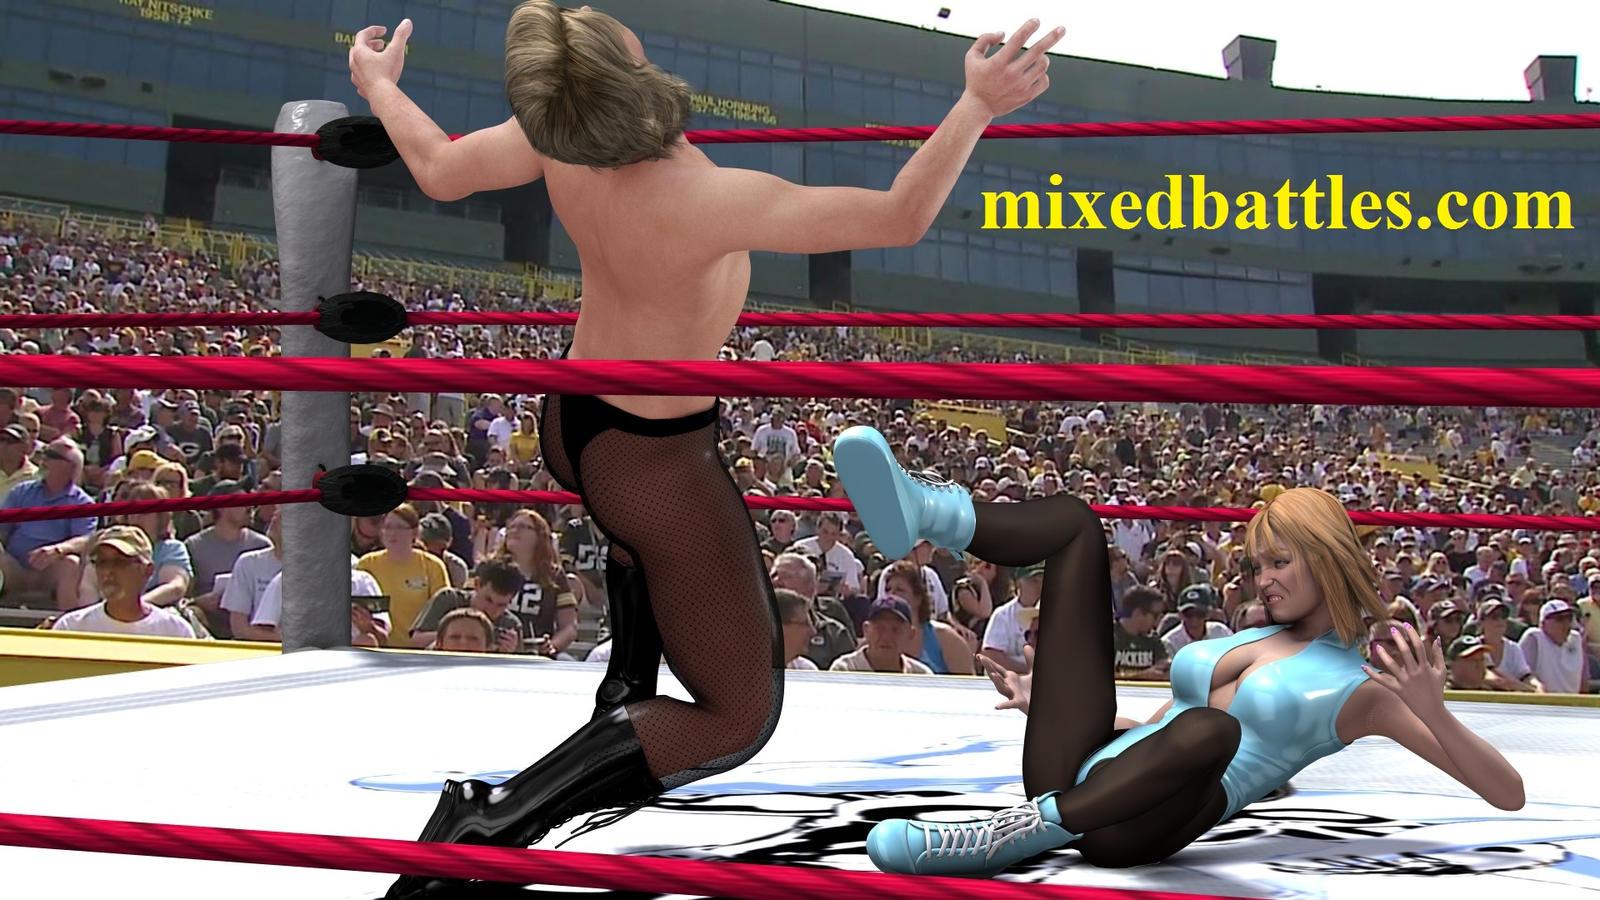 [Image: www_mixedbattles_com_ballbusting_mixed_w...a389vf.jpg]